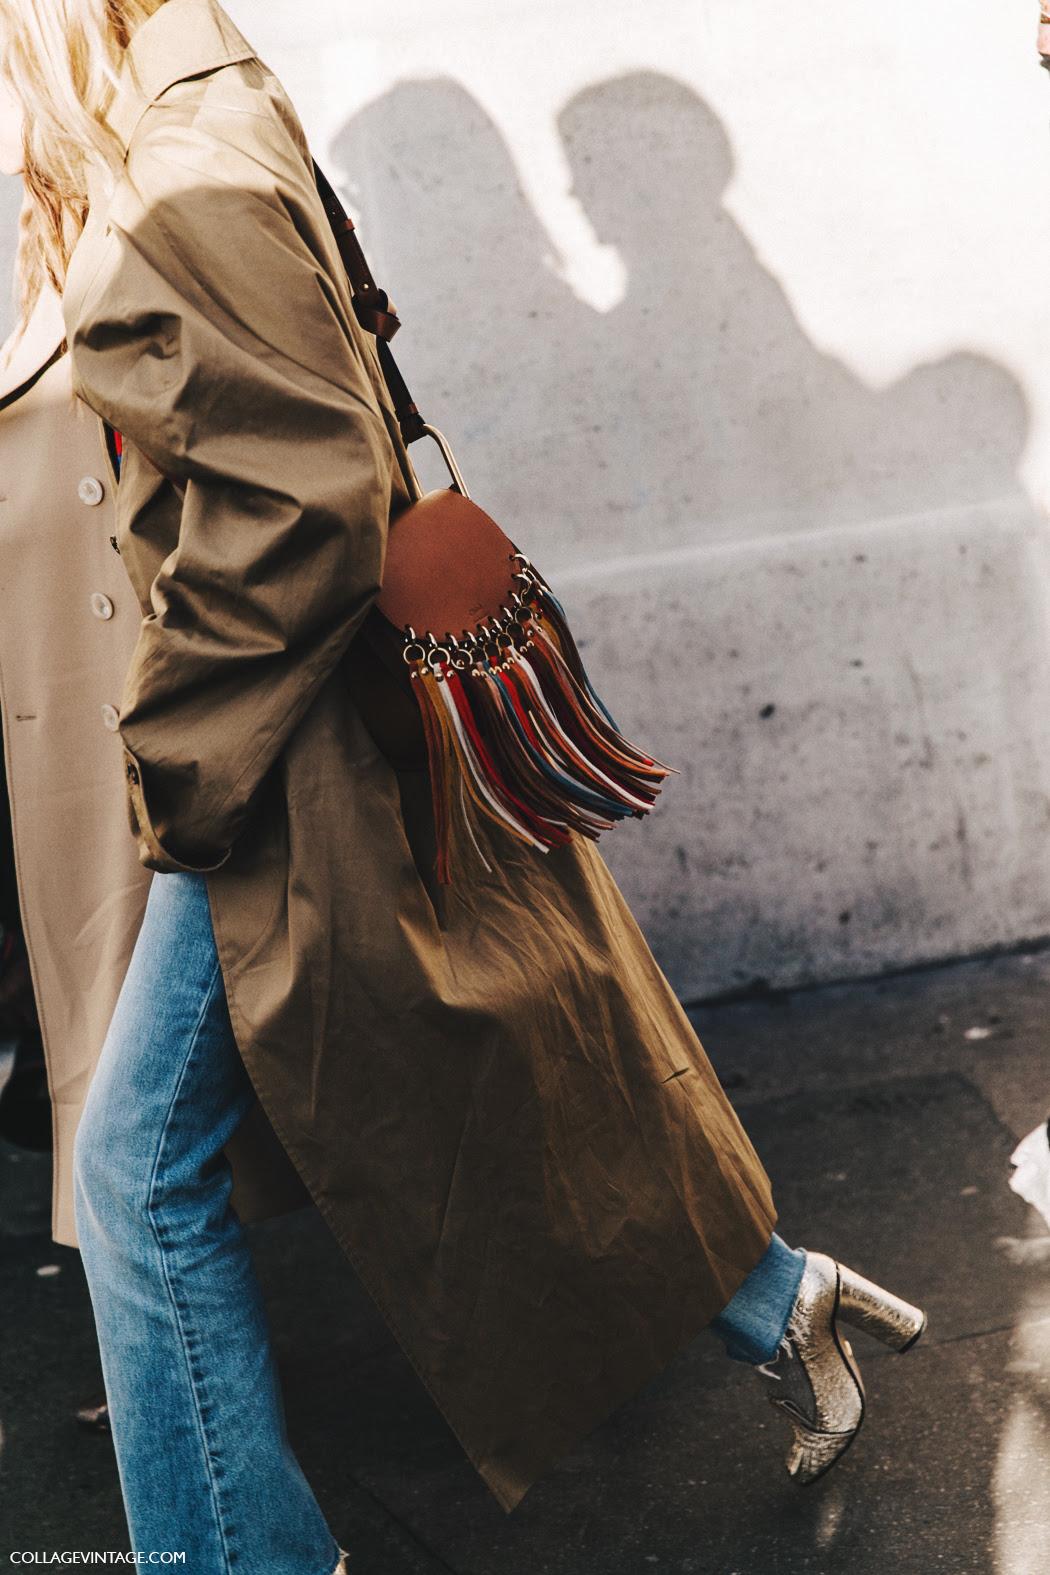 PFW-Paris_Fashion_Week_Fall_2016-Street_Style-Collage_Vintage-Pernille_Teisbaek-Vetements-Trench-Jeans-Chloe_Bag-2